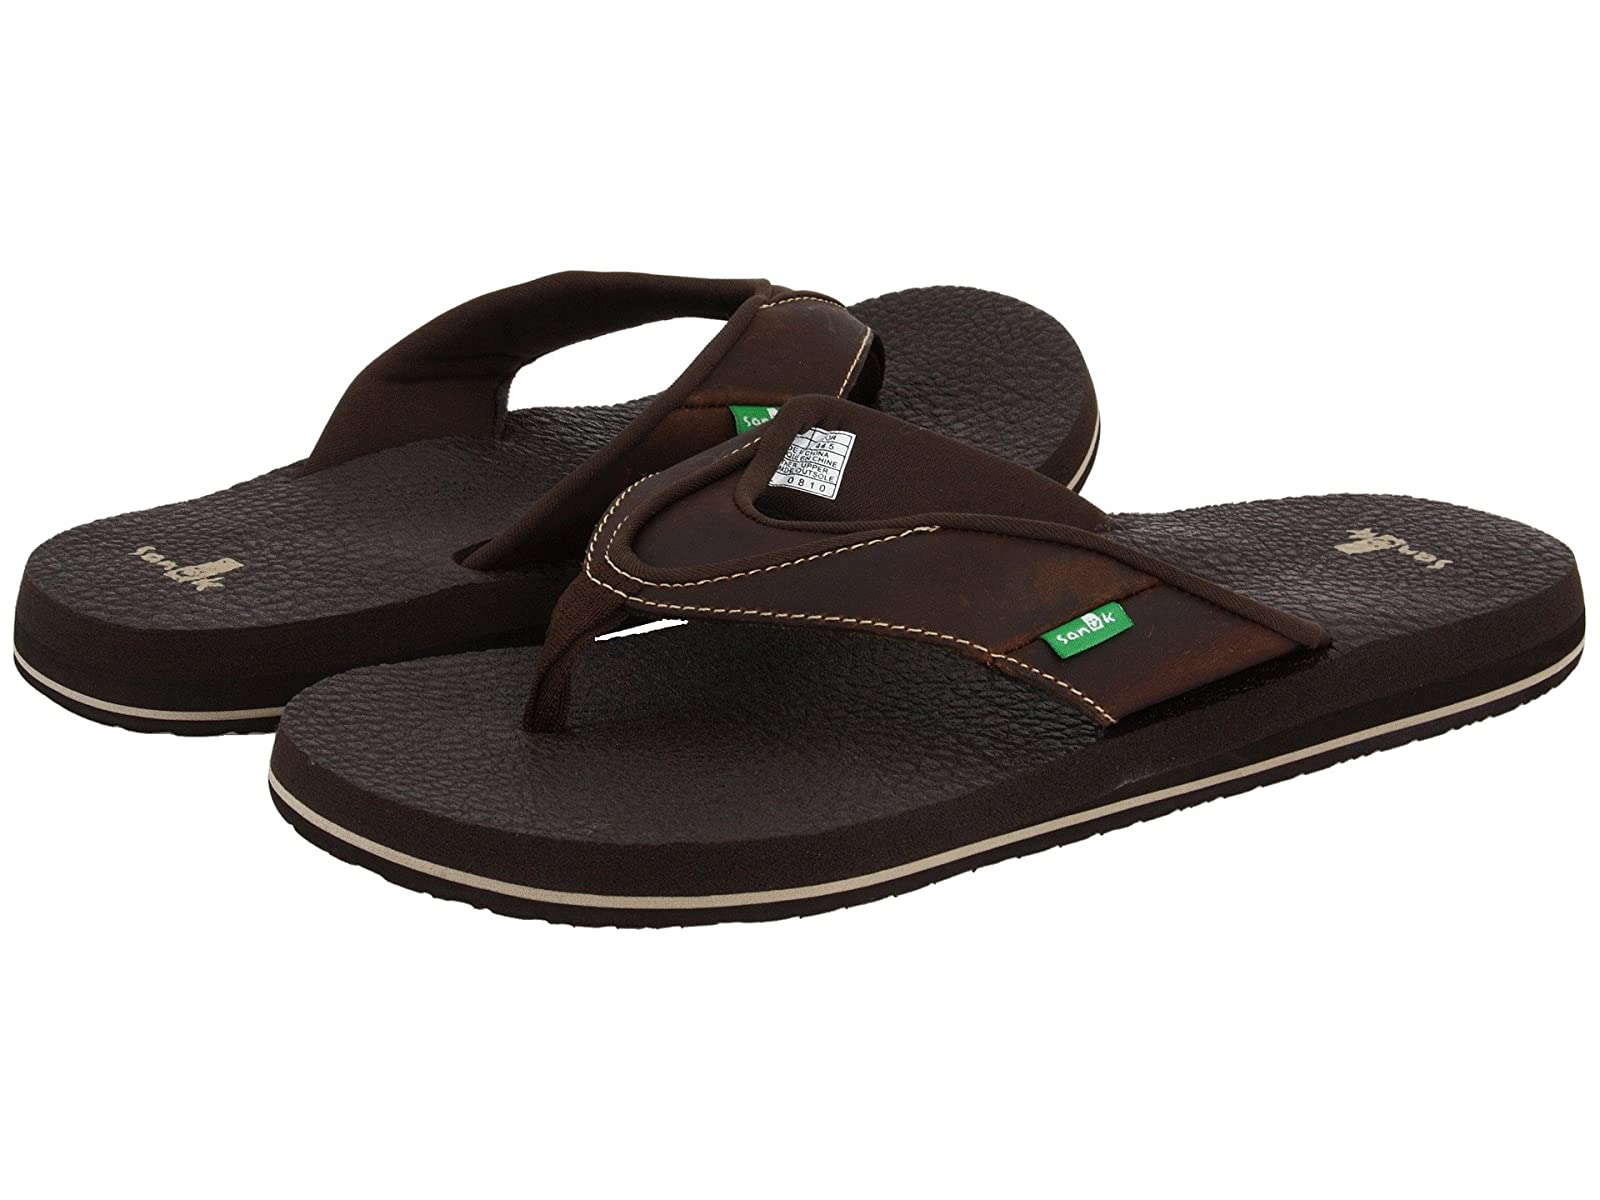 Sanuk Beer Cozy PrimoAtmospheric grades have affordable shoes